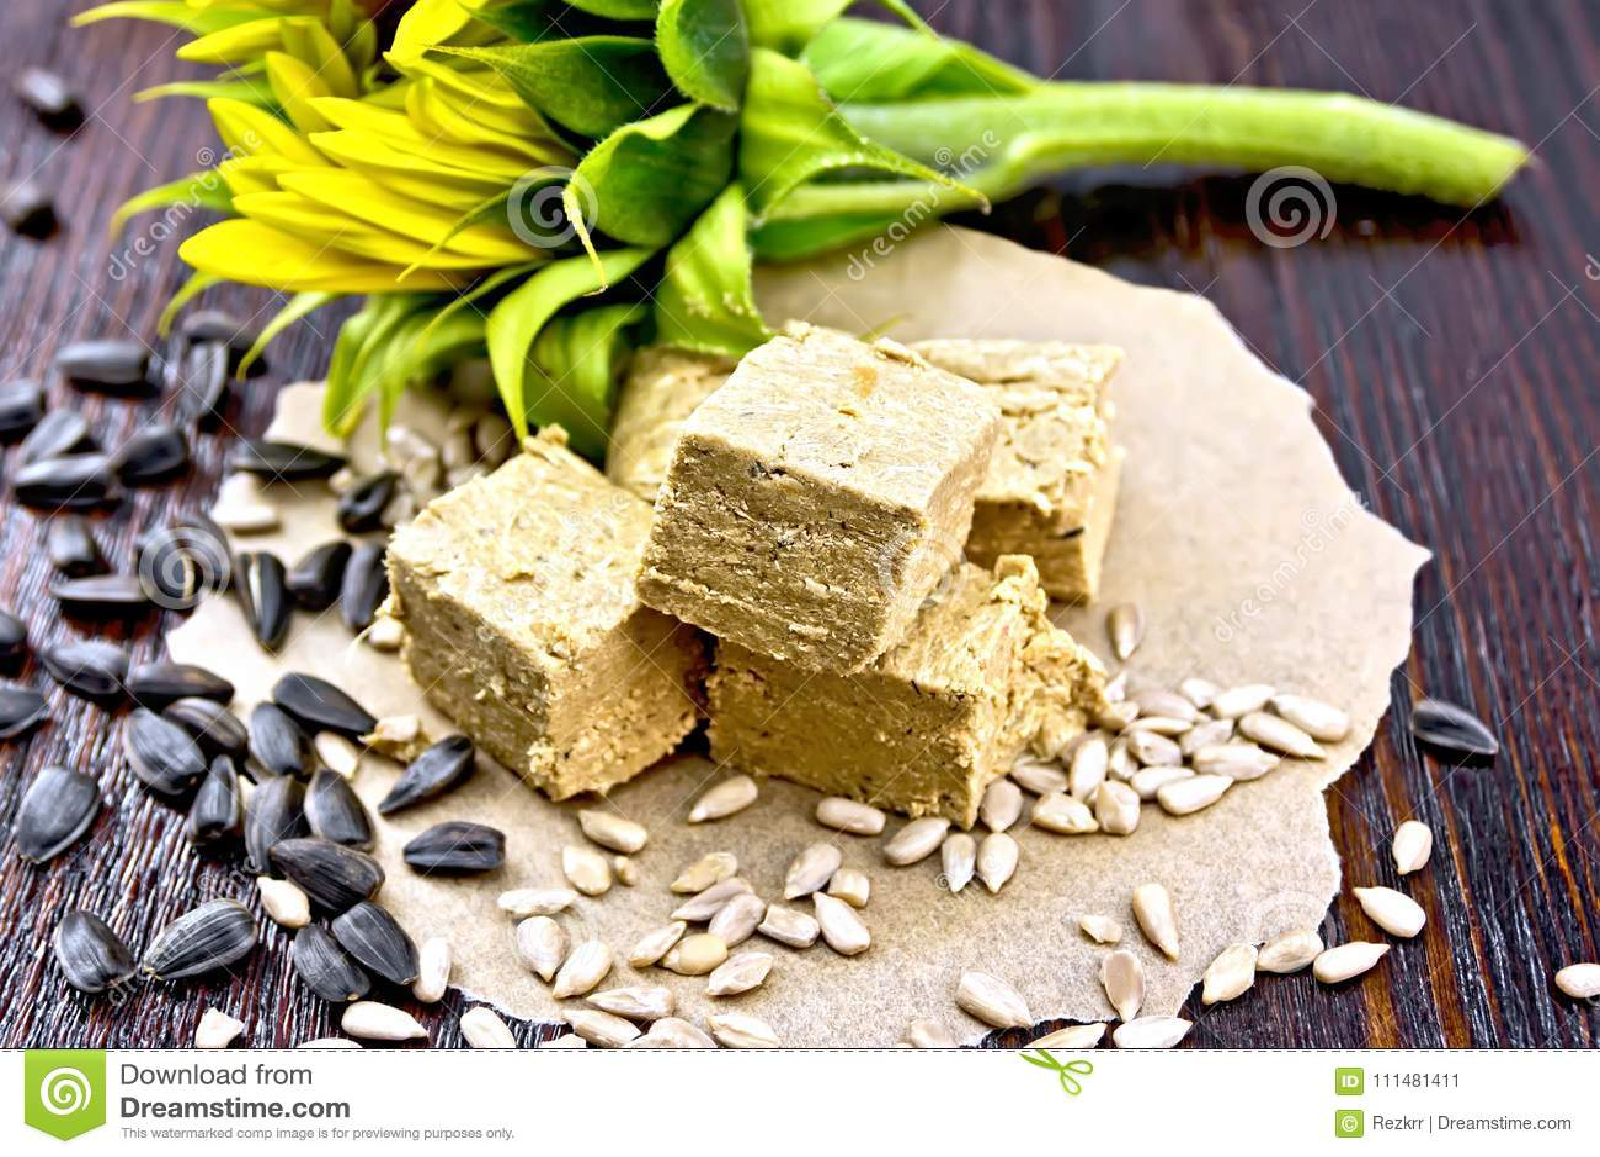 Halva On Paper With Sunflower Stock Image Image Of Halva